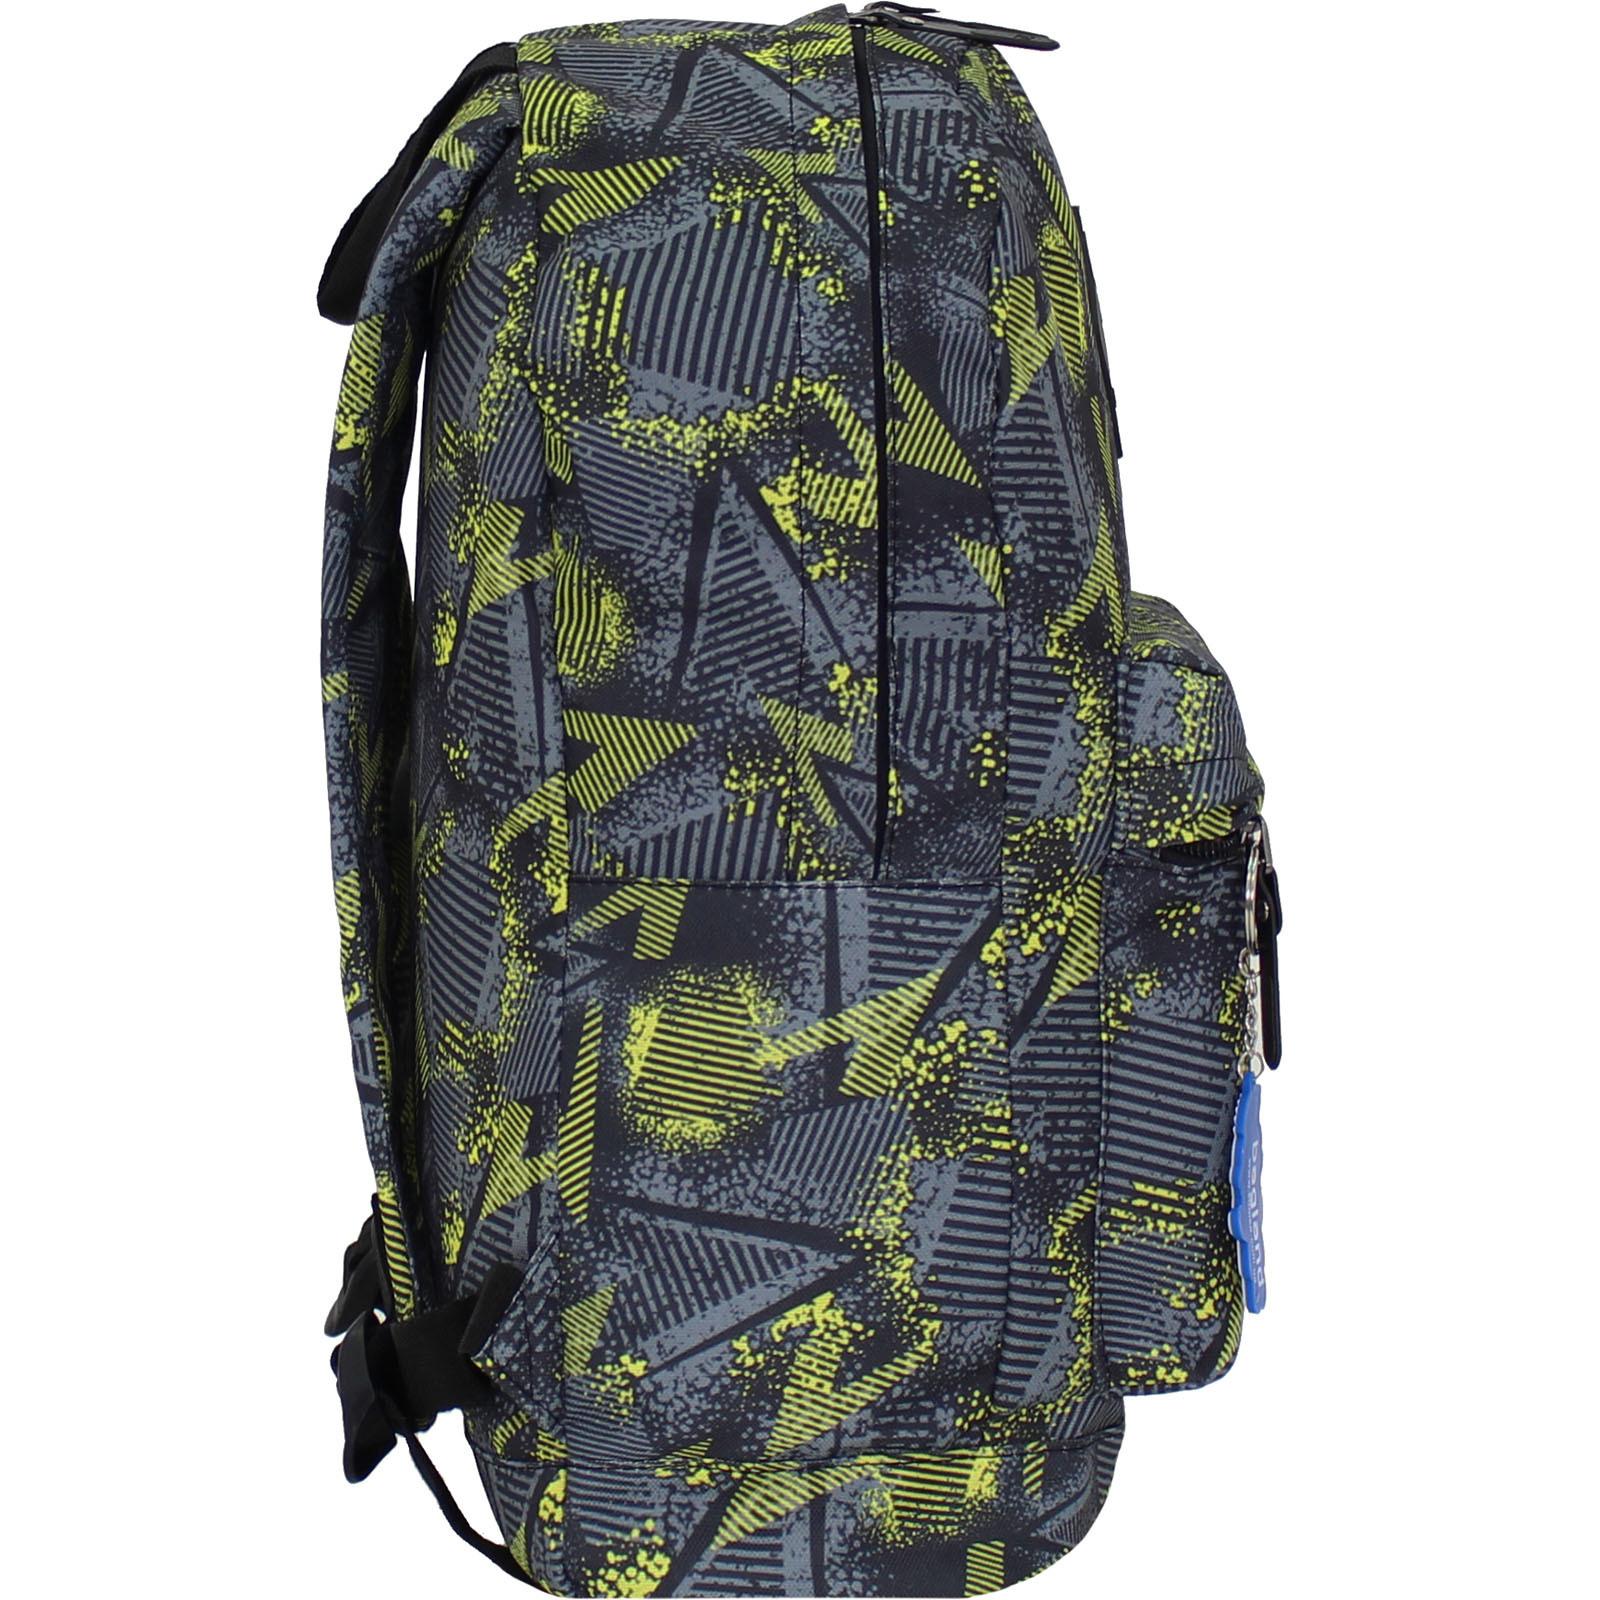 Рюкзак Bagland Молодежный (дизайн) 17 л. сублимация 205 (00533664)